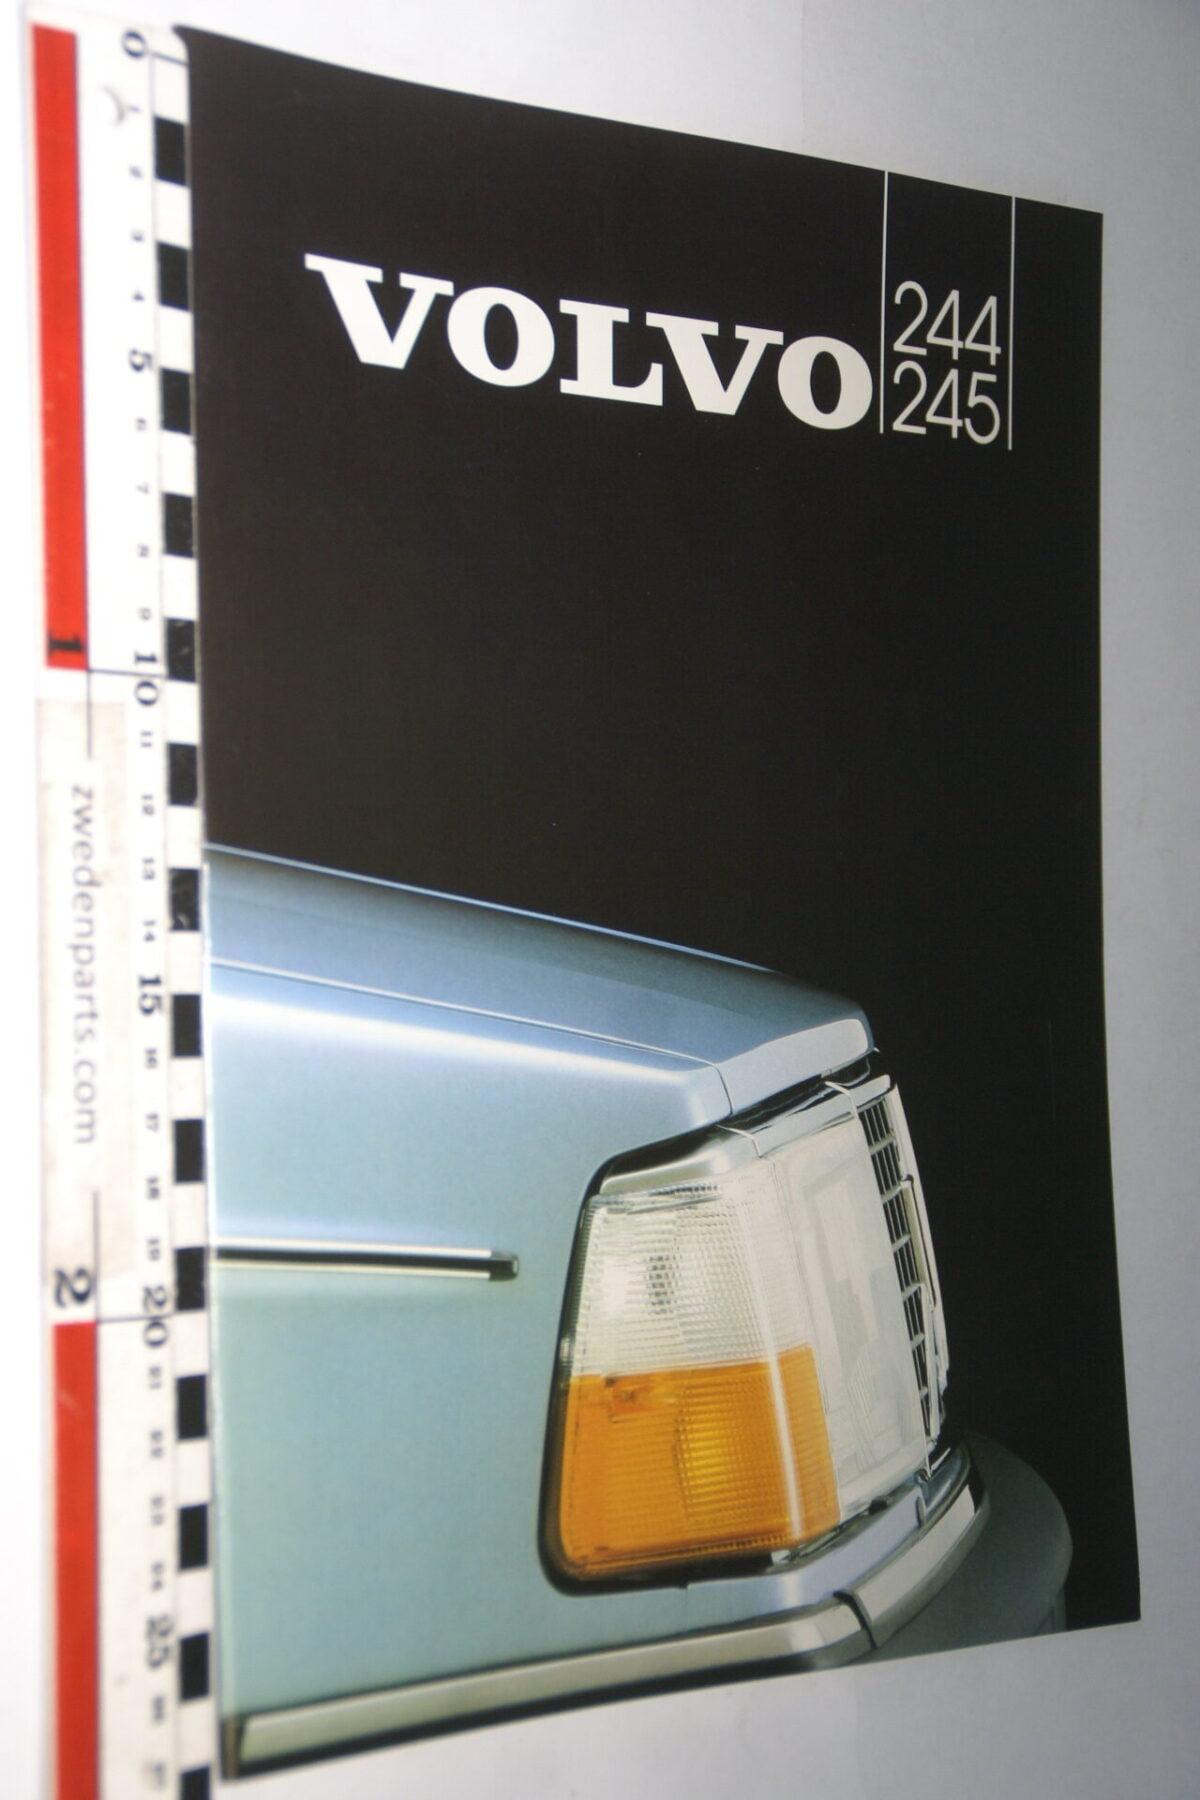 DSC07703 1982 originele brochure Volvo 244 245 nr ASPPV 9583-651c0f14